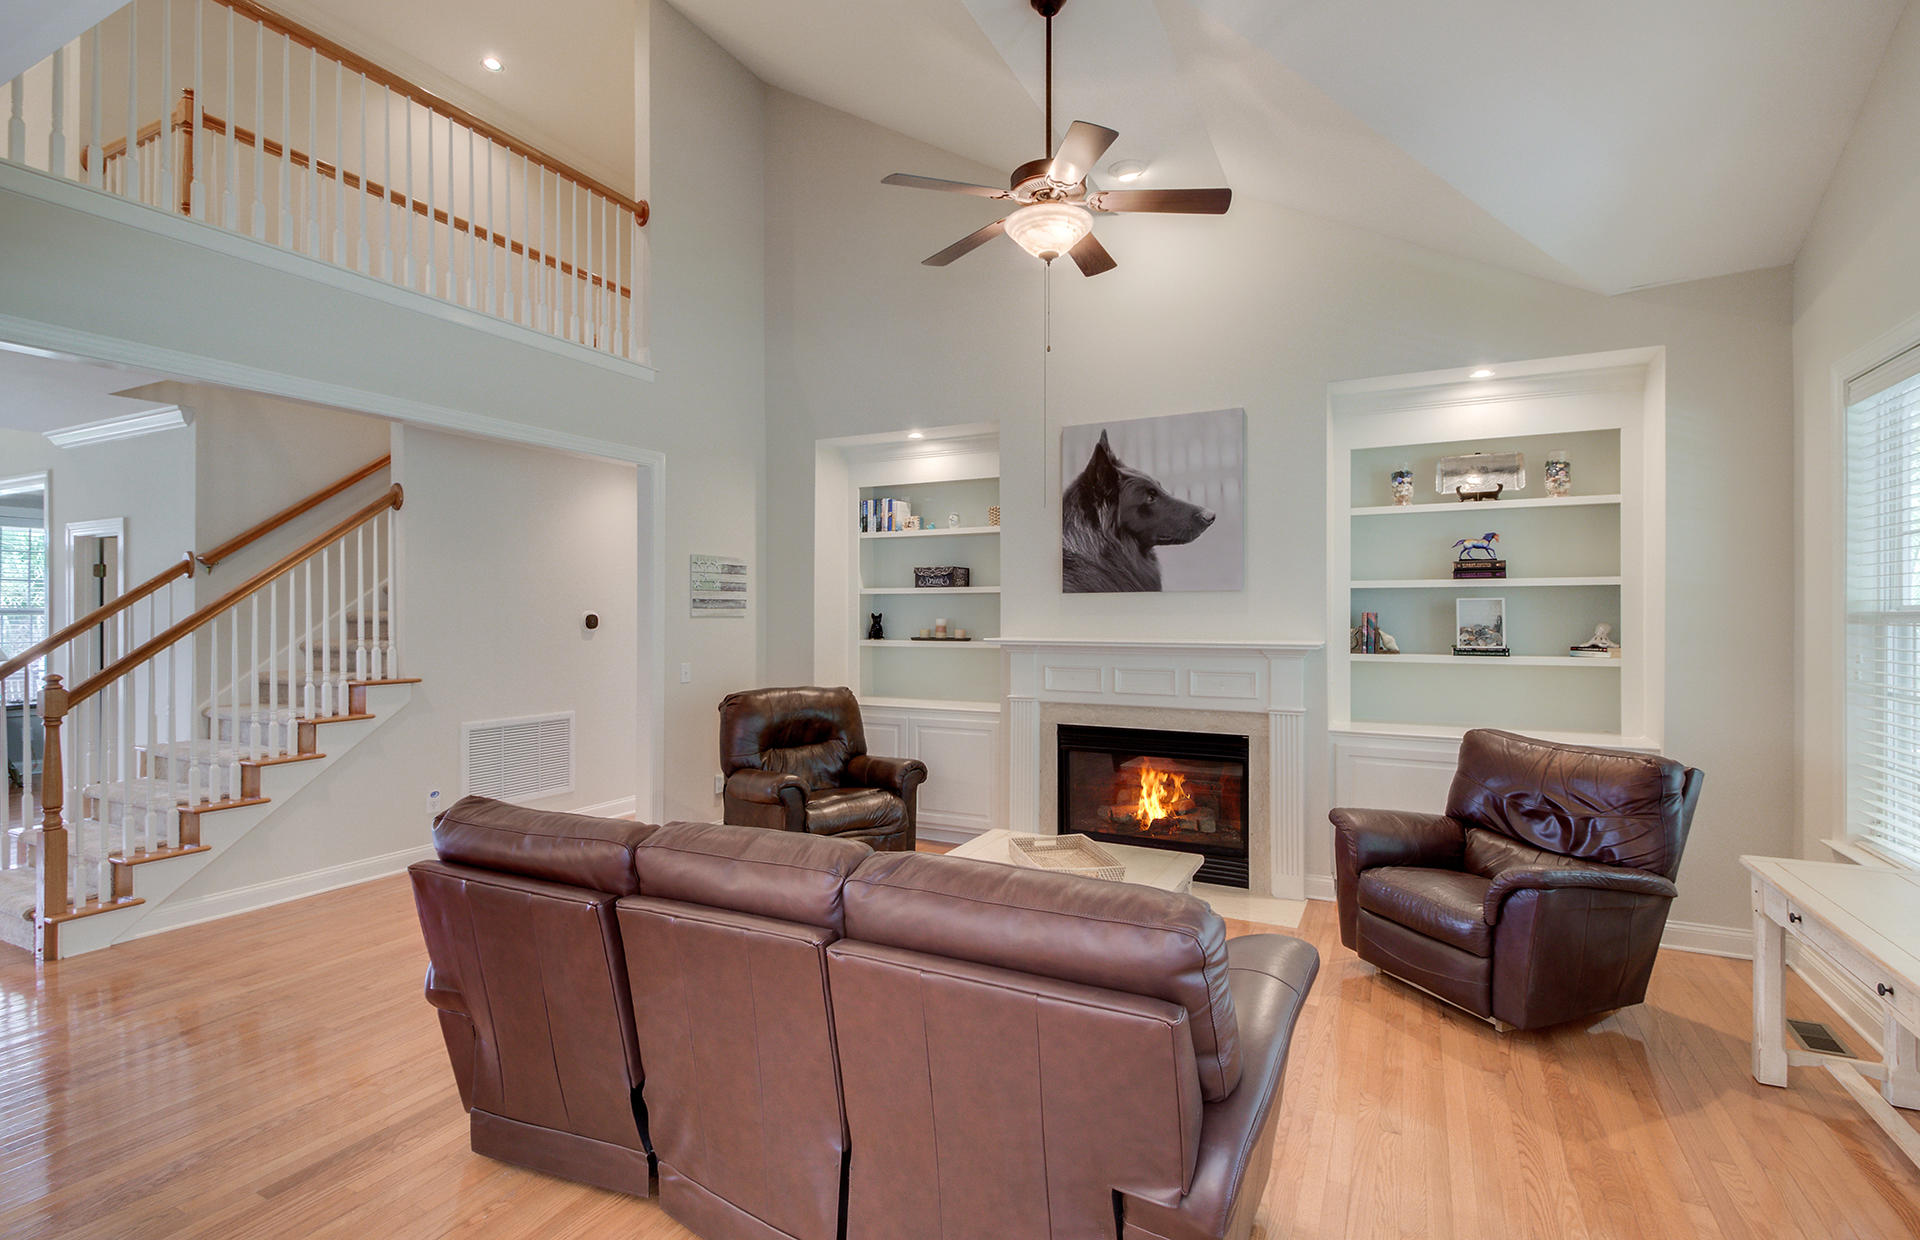 Dunes West Homes For Sale - 2453 Darts Cove, Mount Pleasant, SC - 46